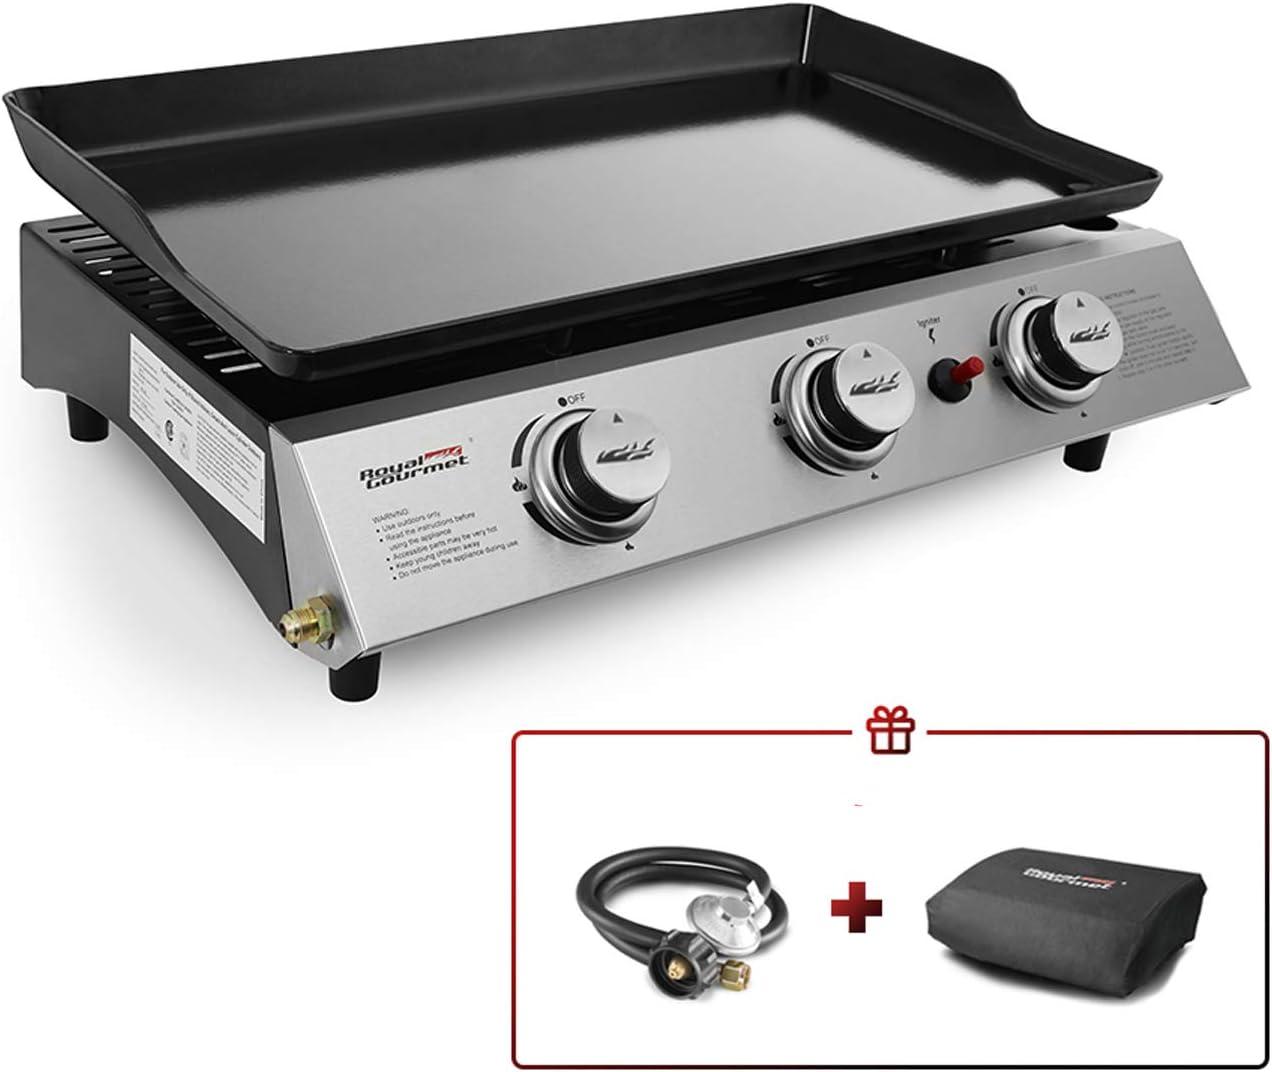 royal-gourmet-pd1300-portable-3-burner-propane-gas-grill